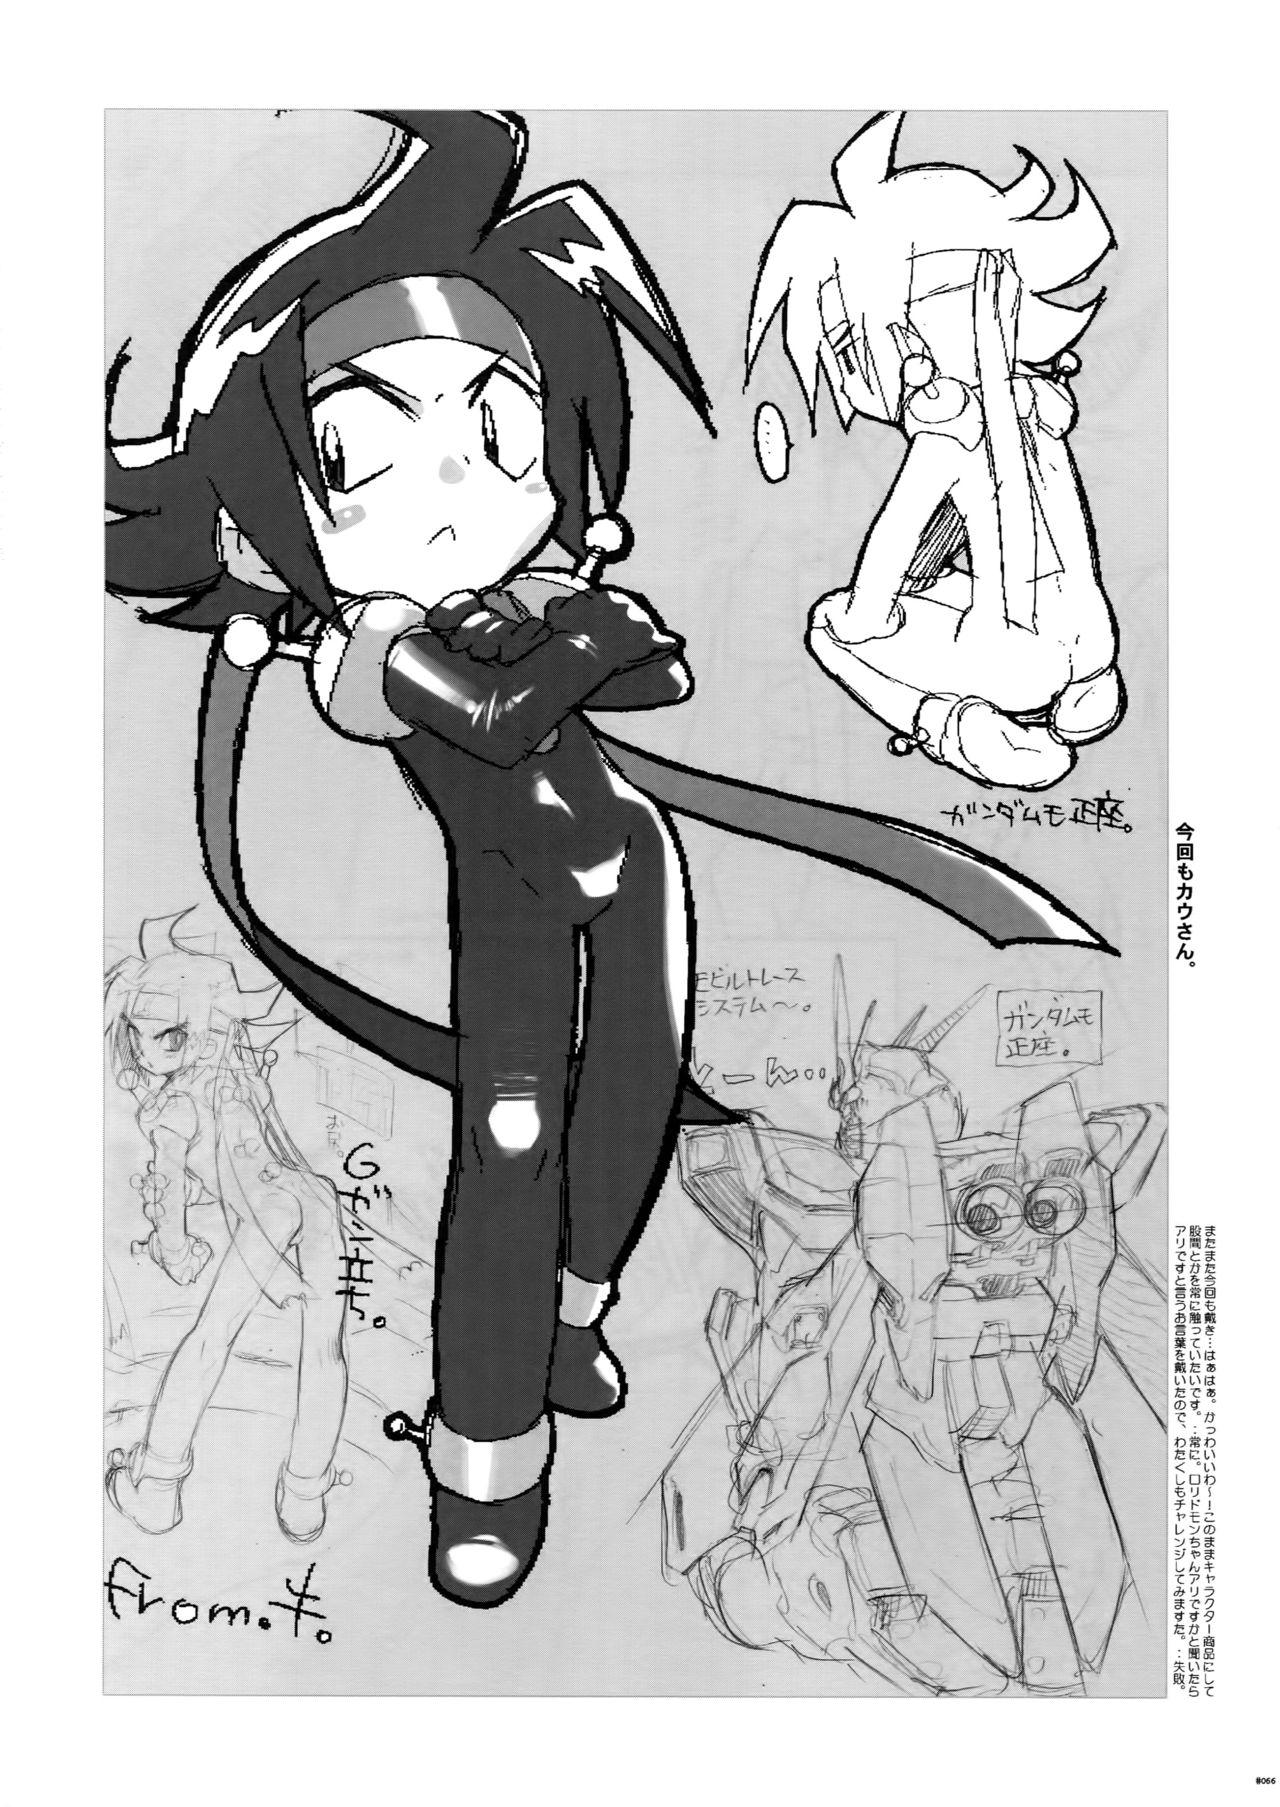 [Article 60 of Criminal Code (Shuhan)] G-gan Josei-Muke Sairoku-Shuu (G Gundam) 65